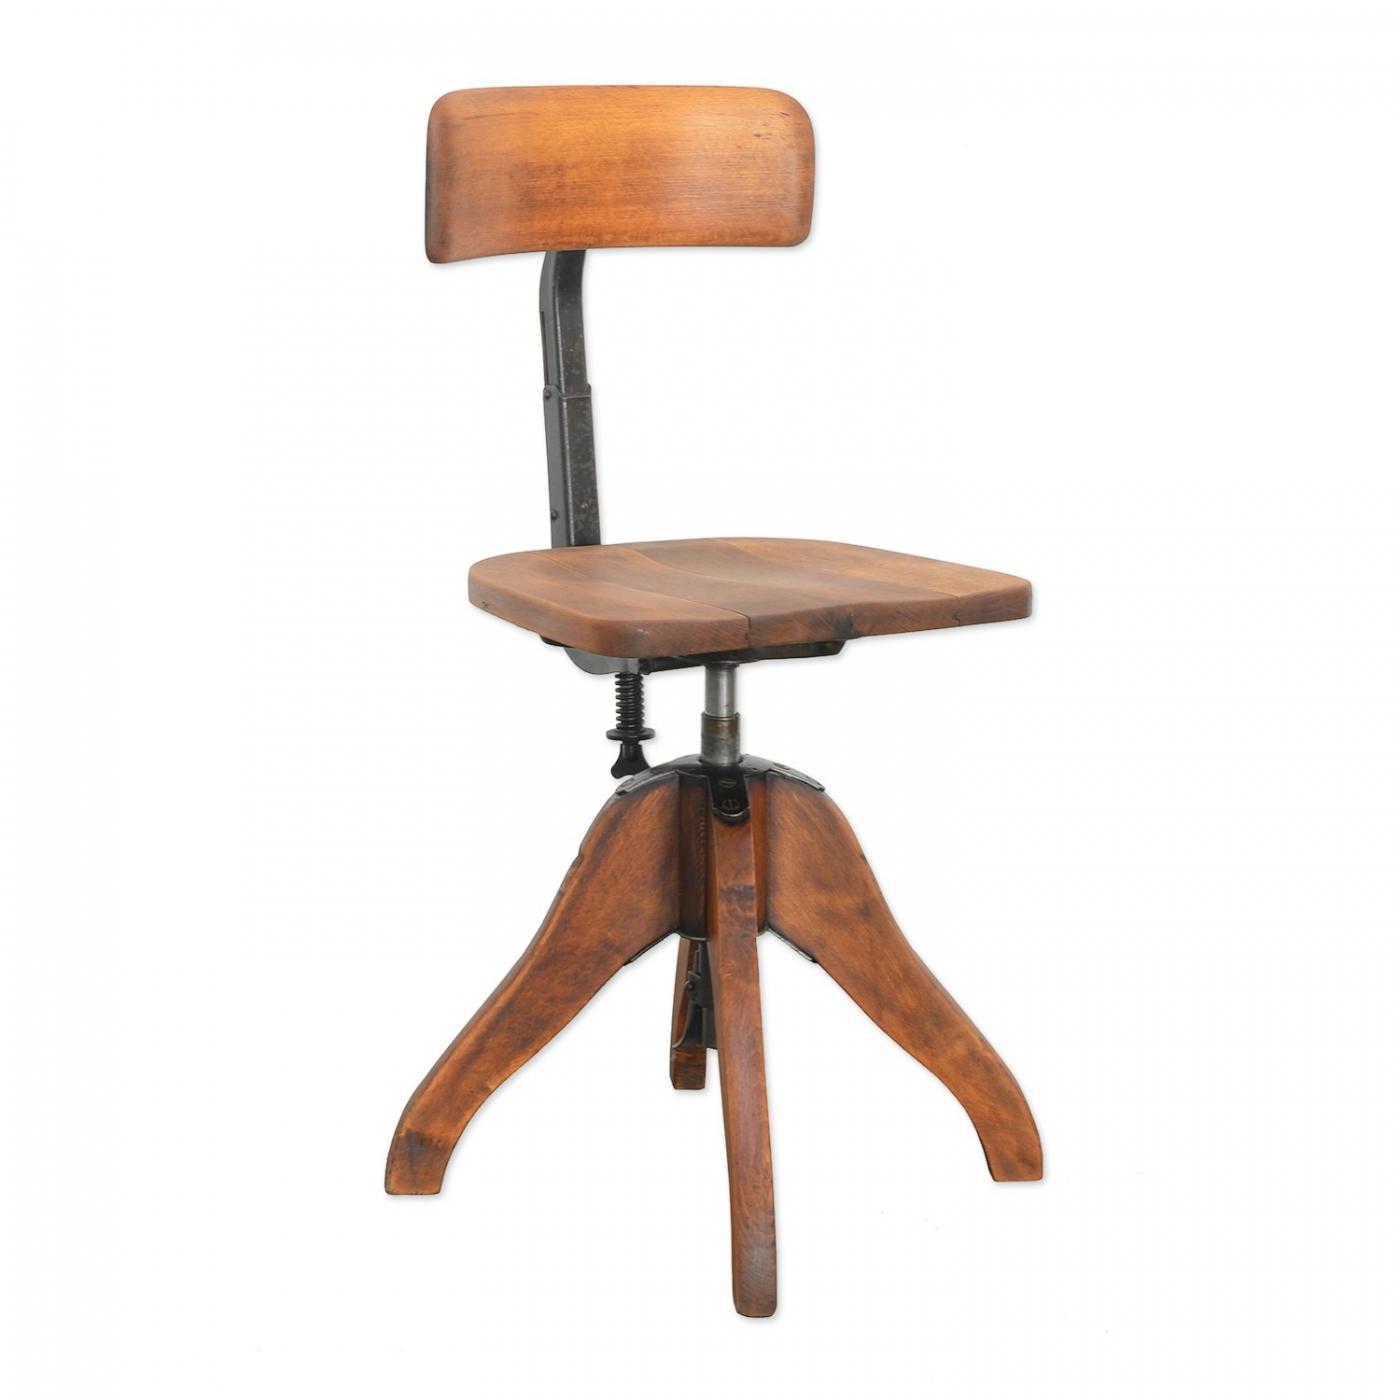 originaler b rostuhl der federdreh von albert stoll. Black Bedroom Furniture Sets. Home Design Ideas